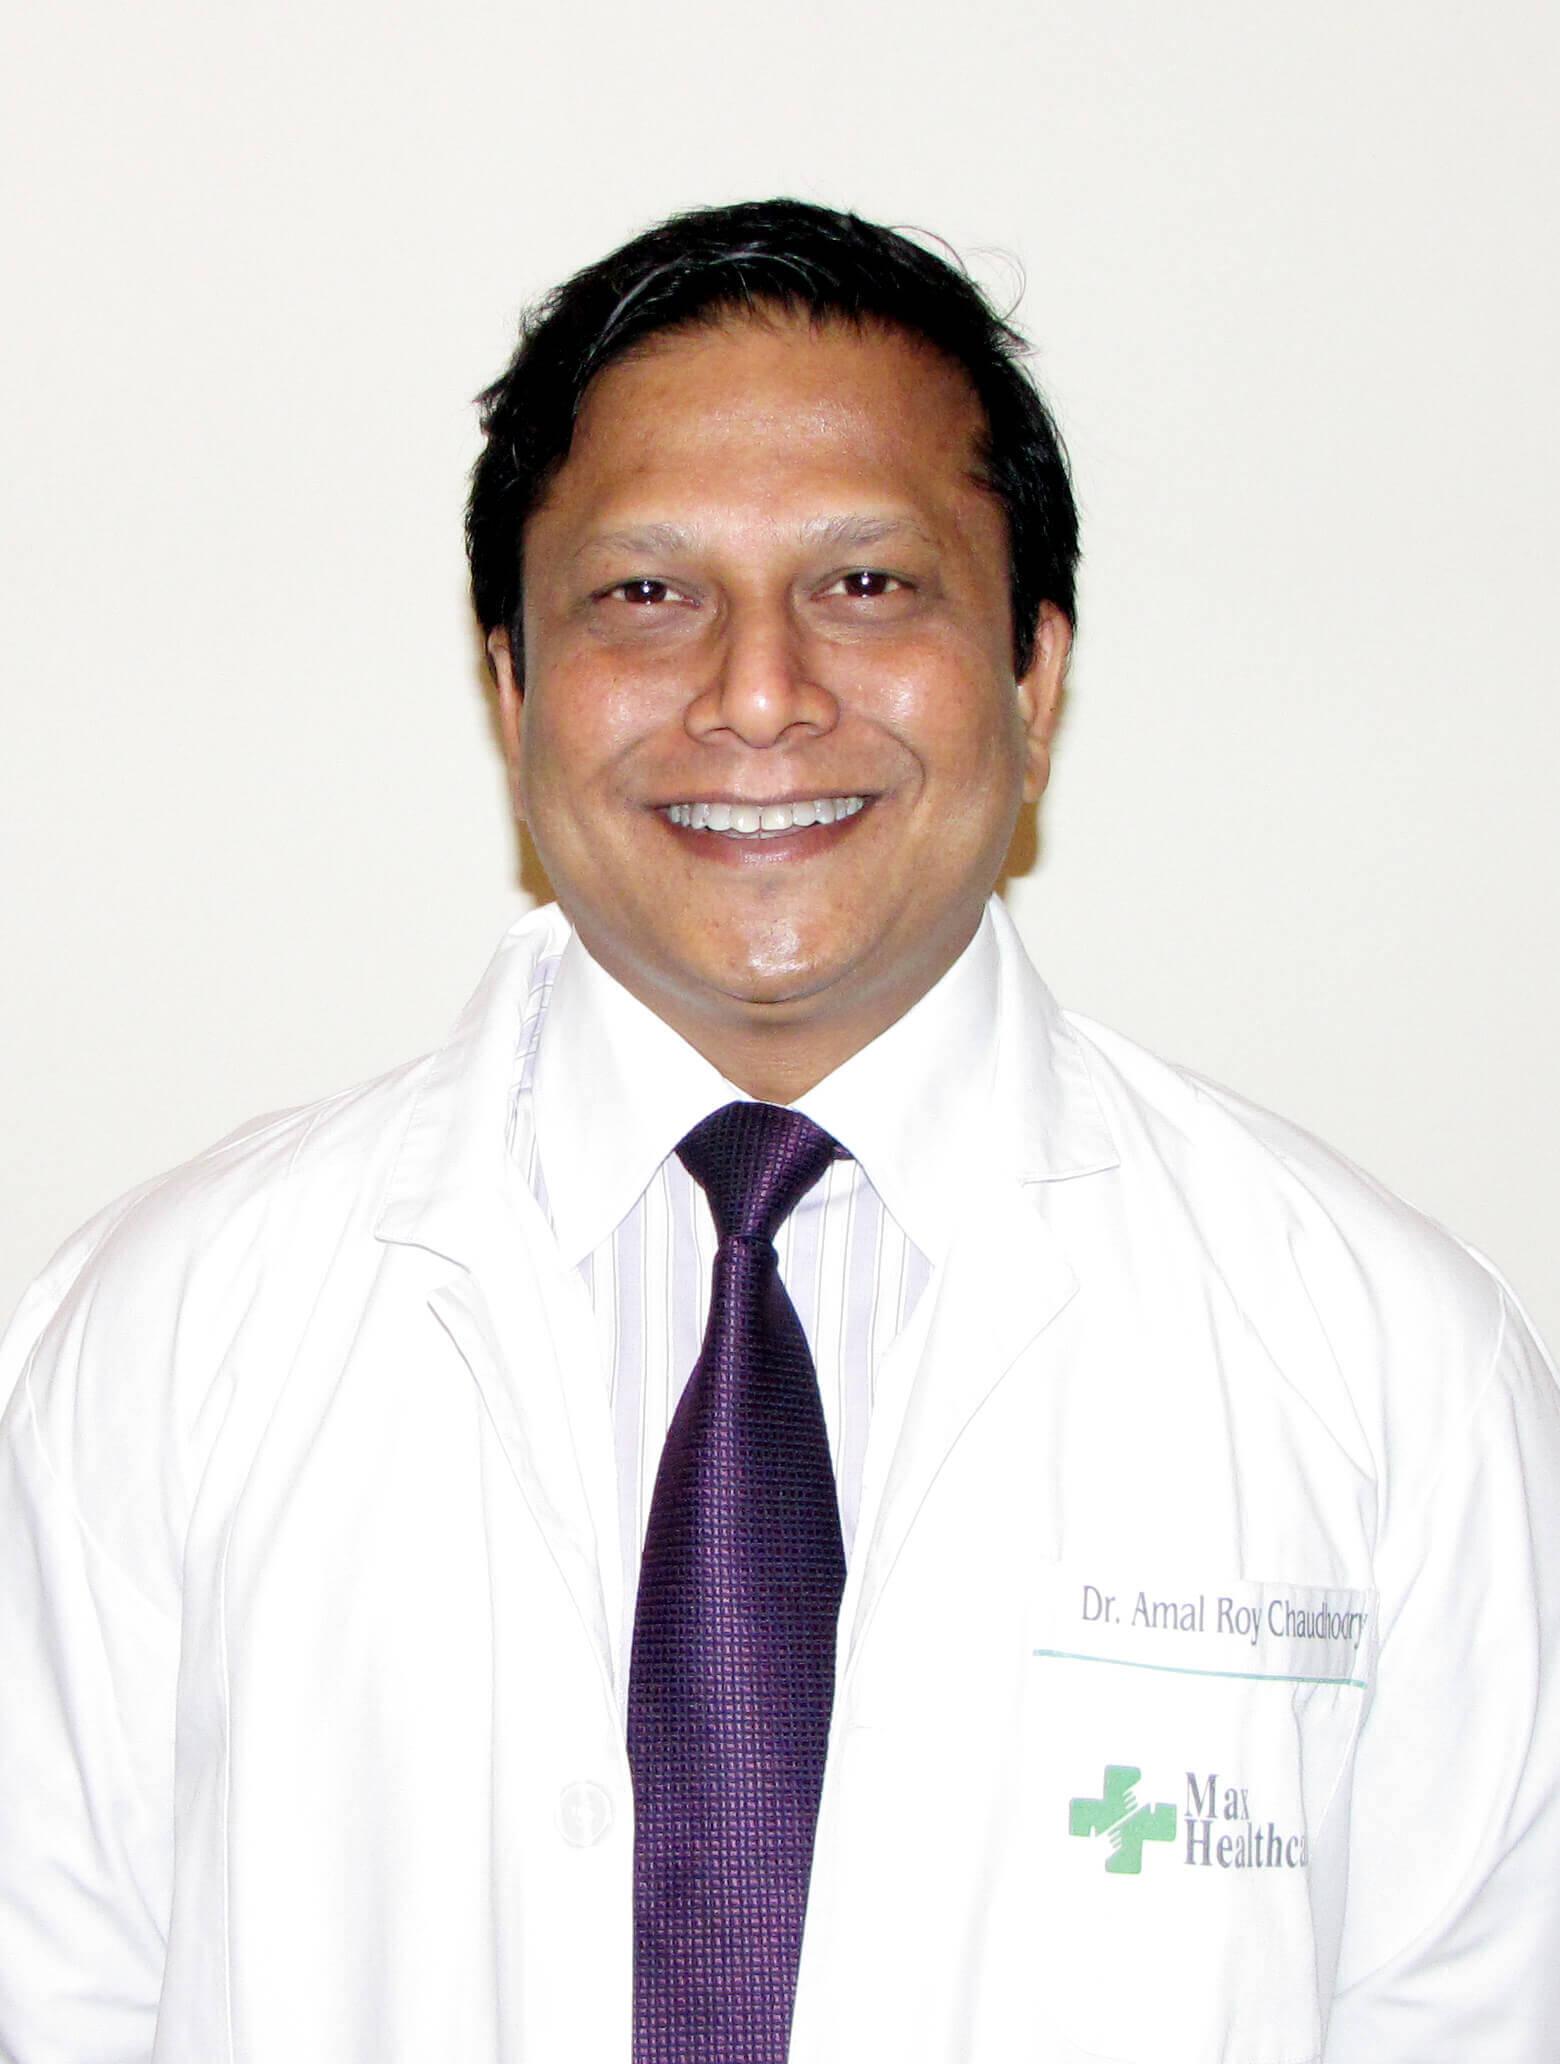 Dr. Amal Roy Chaudhary